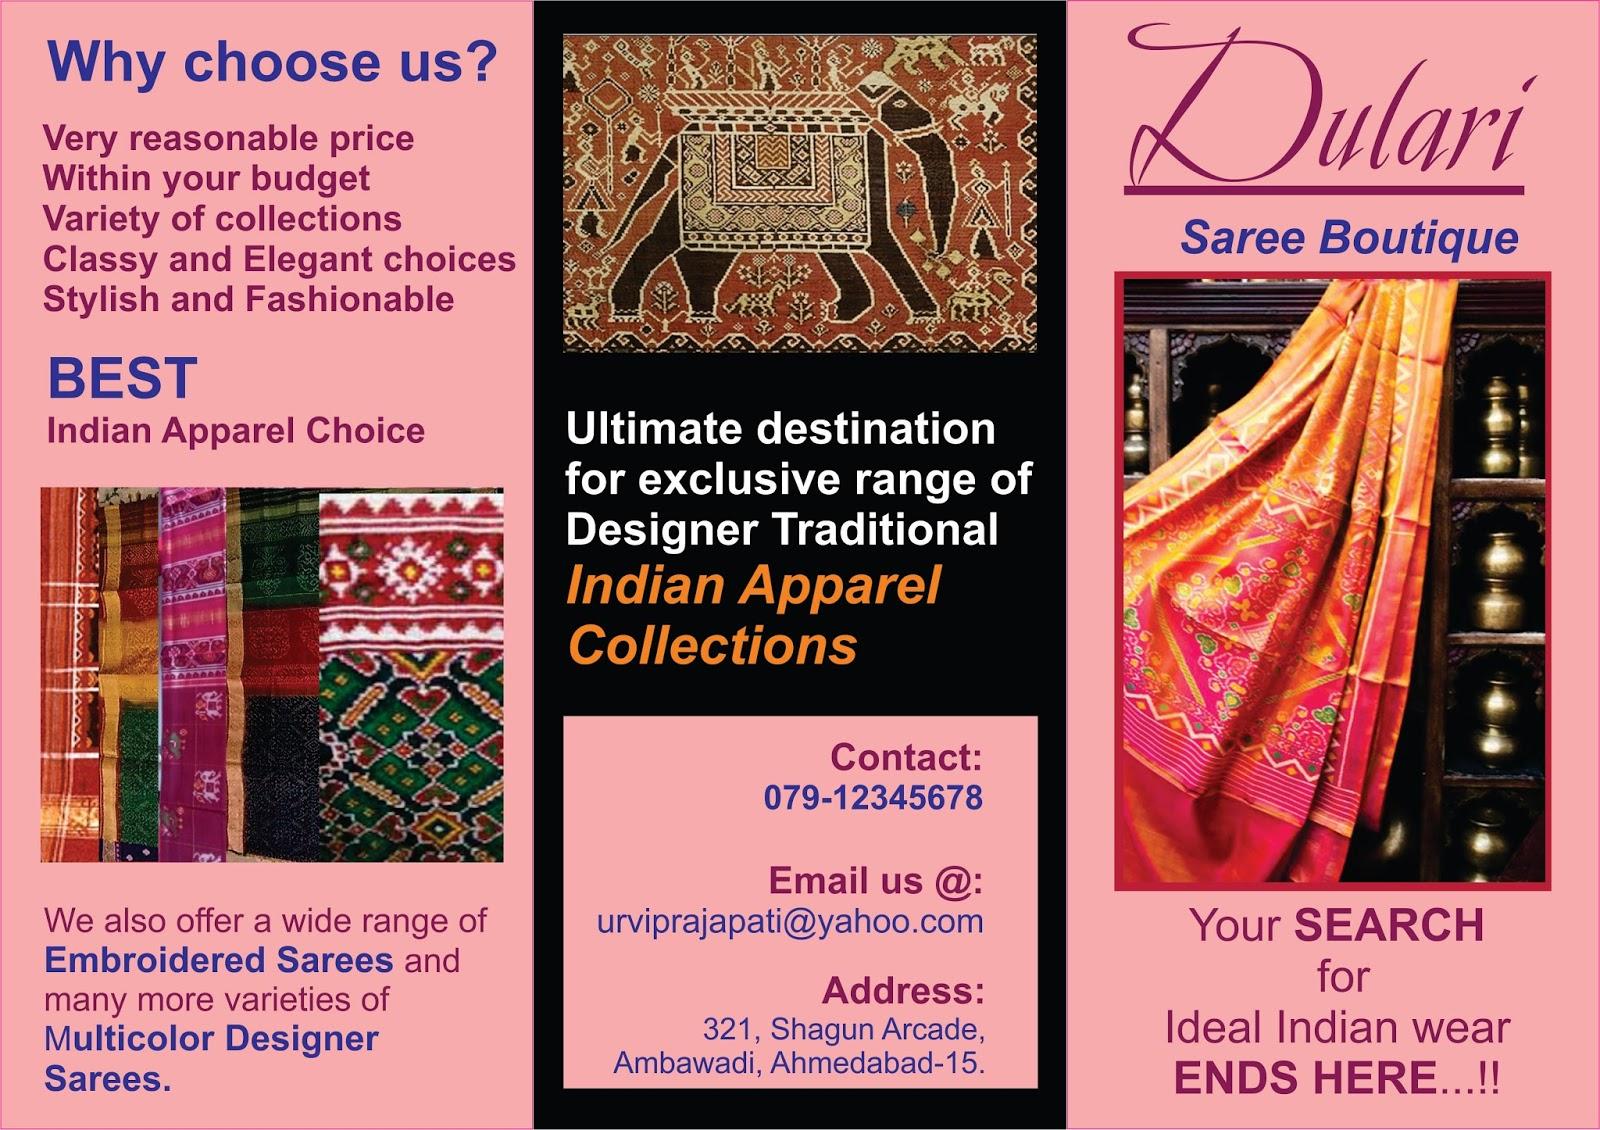 Varsha Bharadwa Saree Boutique Stationery Made Using